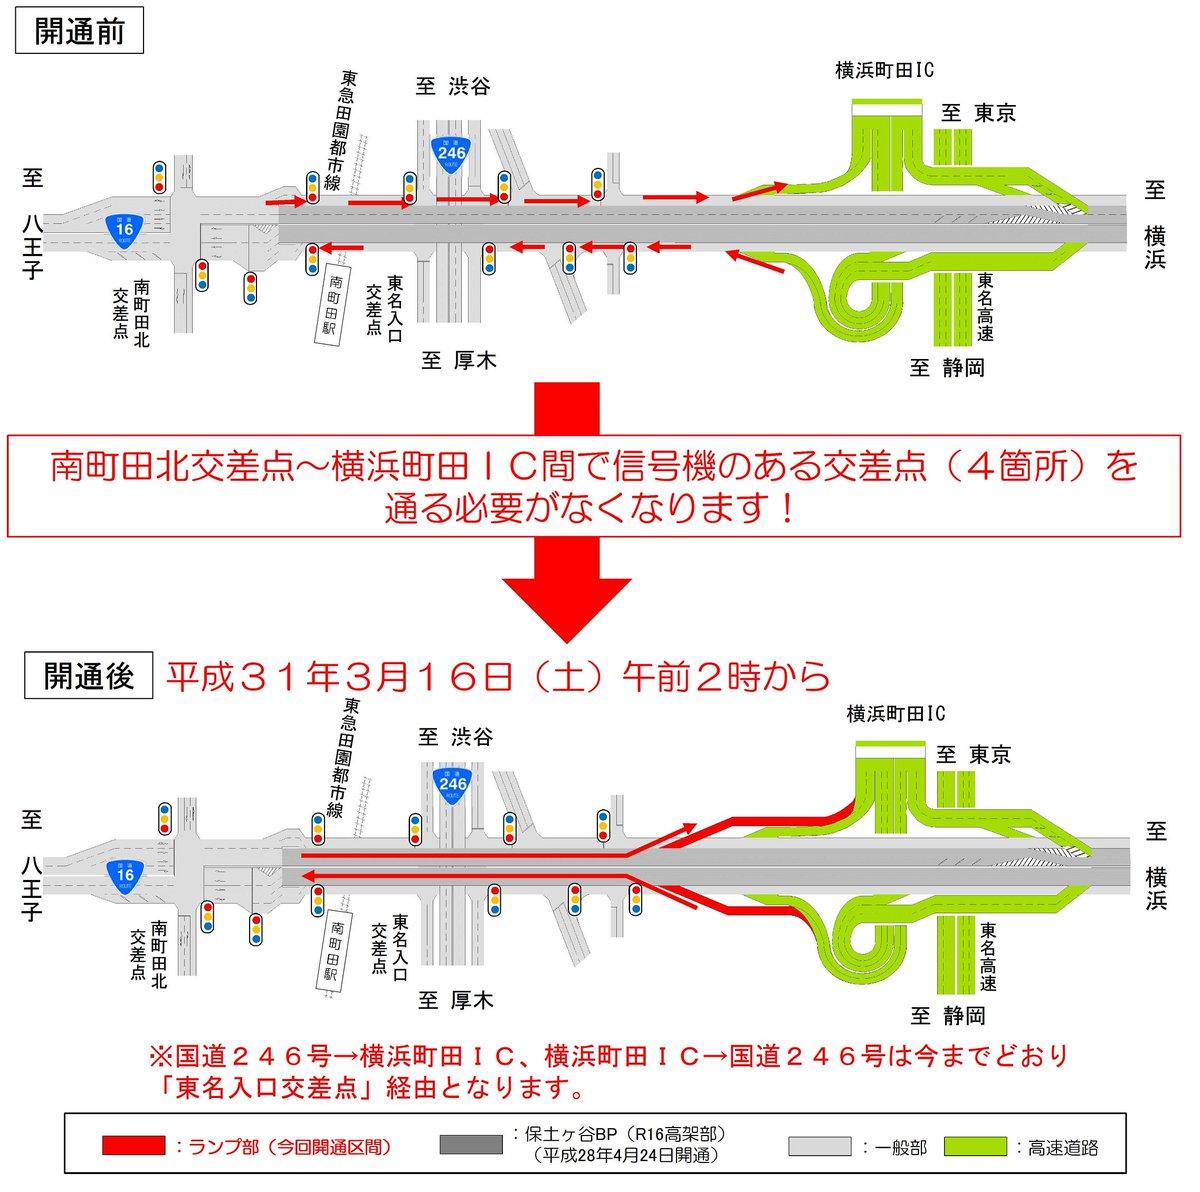 test ツイッターメディア - 平成31年3月16日(土)午前2時、国道16号保土ヶ谷バイパス(八王子側)と東名高速が直結します! 今回の開通で、国道16号八王子方面と東名高速・横浜町田ICのアクセスがさらに便利になります!! 詳しくは→https://t.co/nXmhNzDHyY https://t.co/pBqprn6bqV